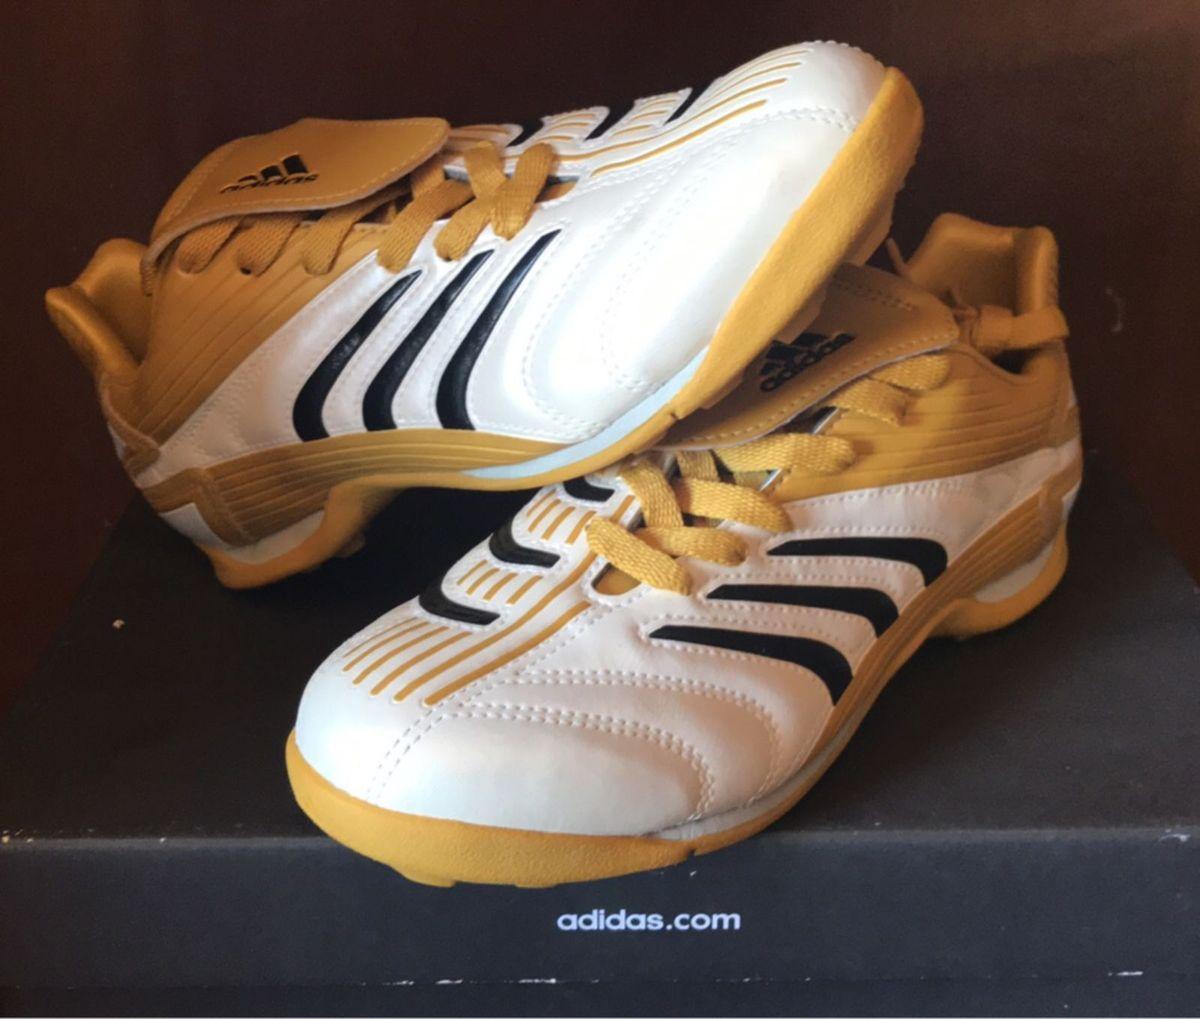 3cd7084ddd chuteira society adidas predito juvenil (diversos tamanhos) - esportes  adidas